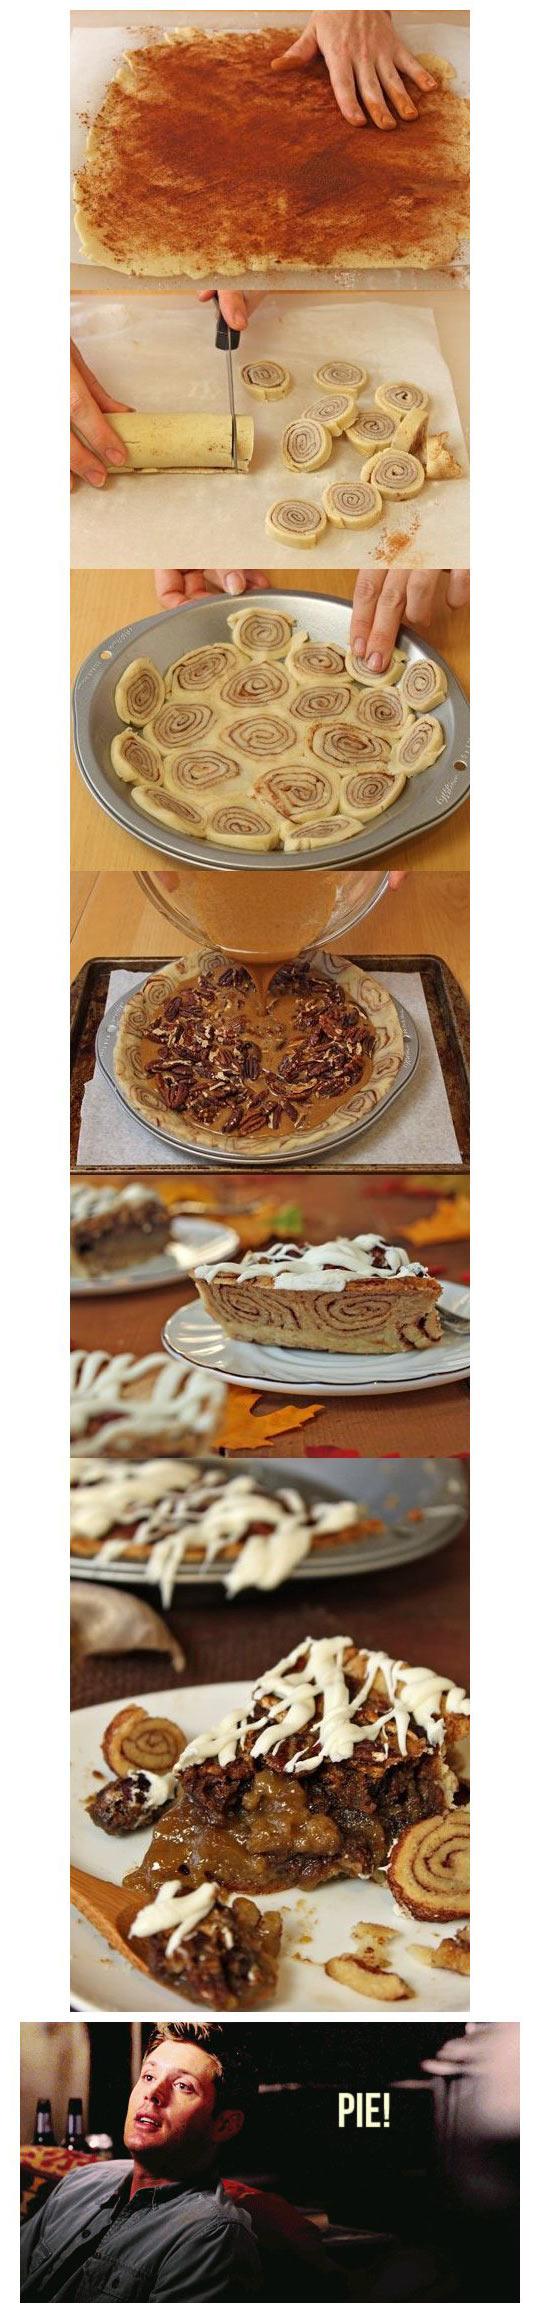 Pie Deliciousness